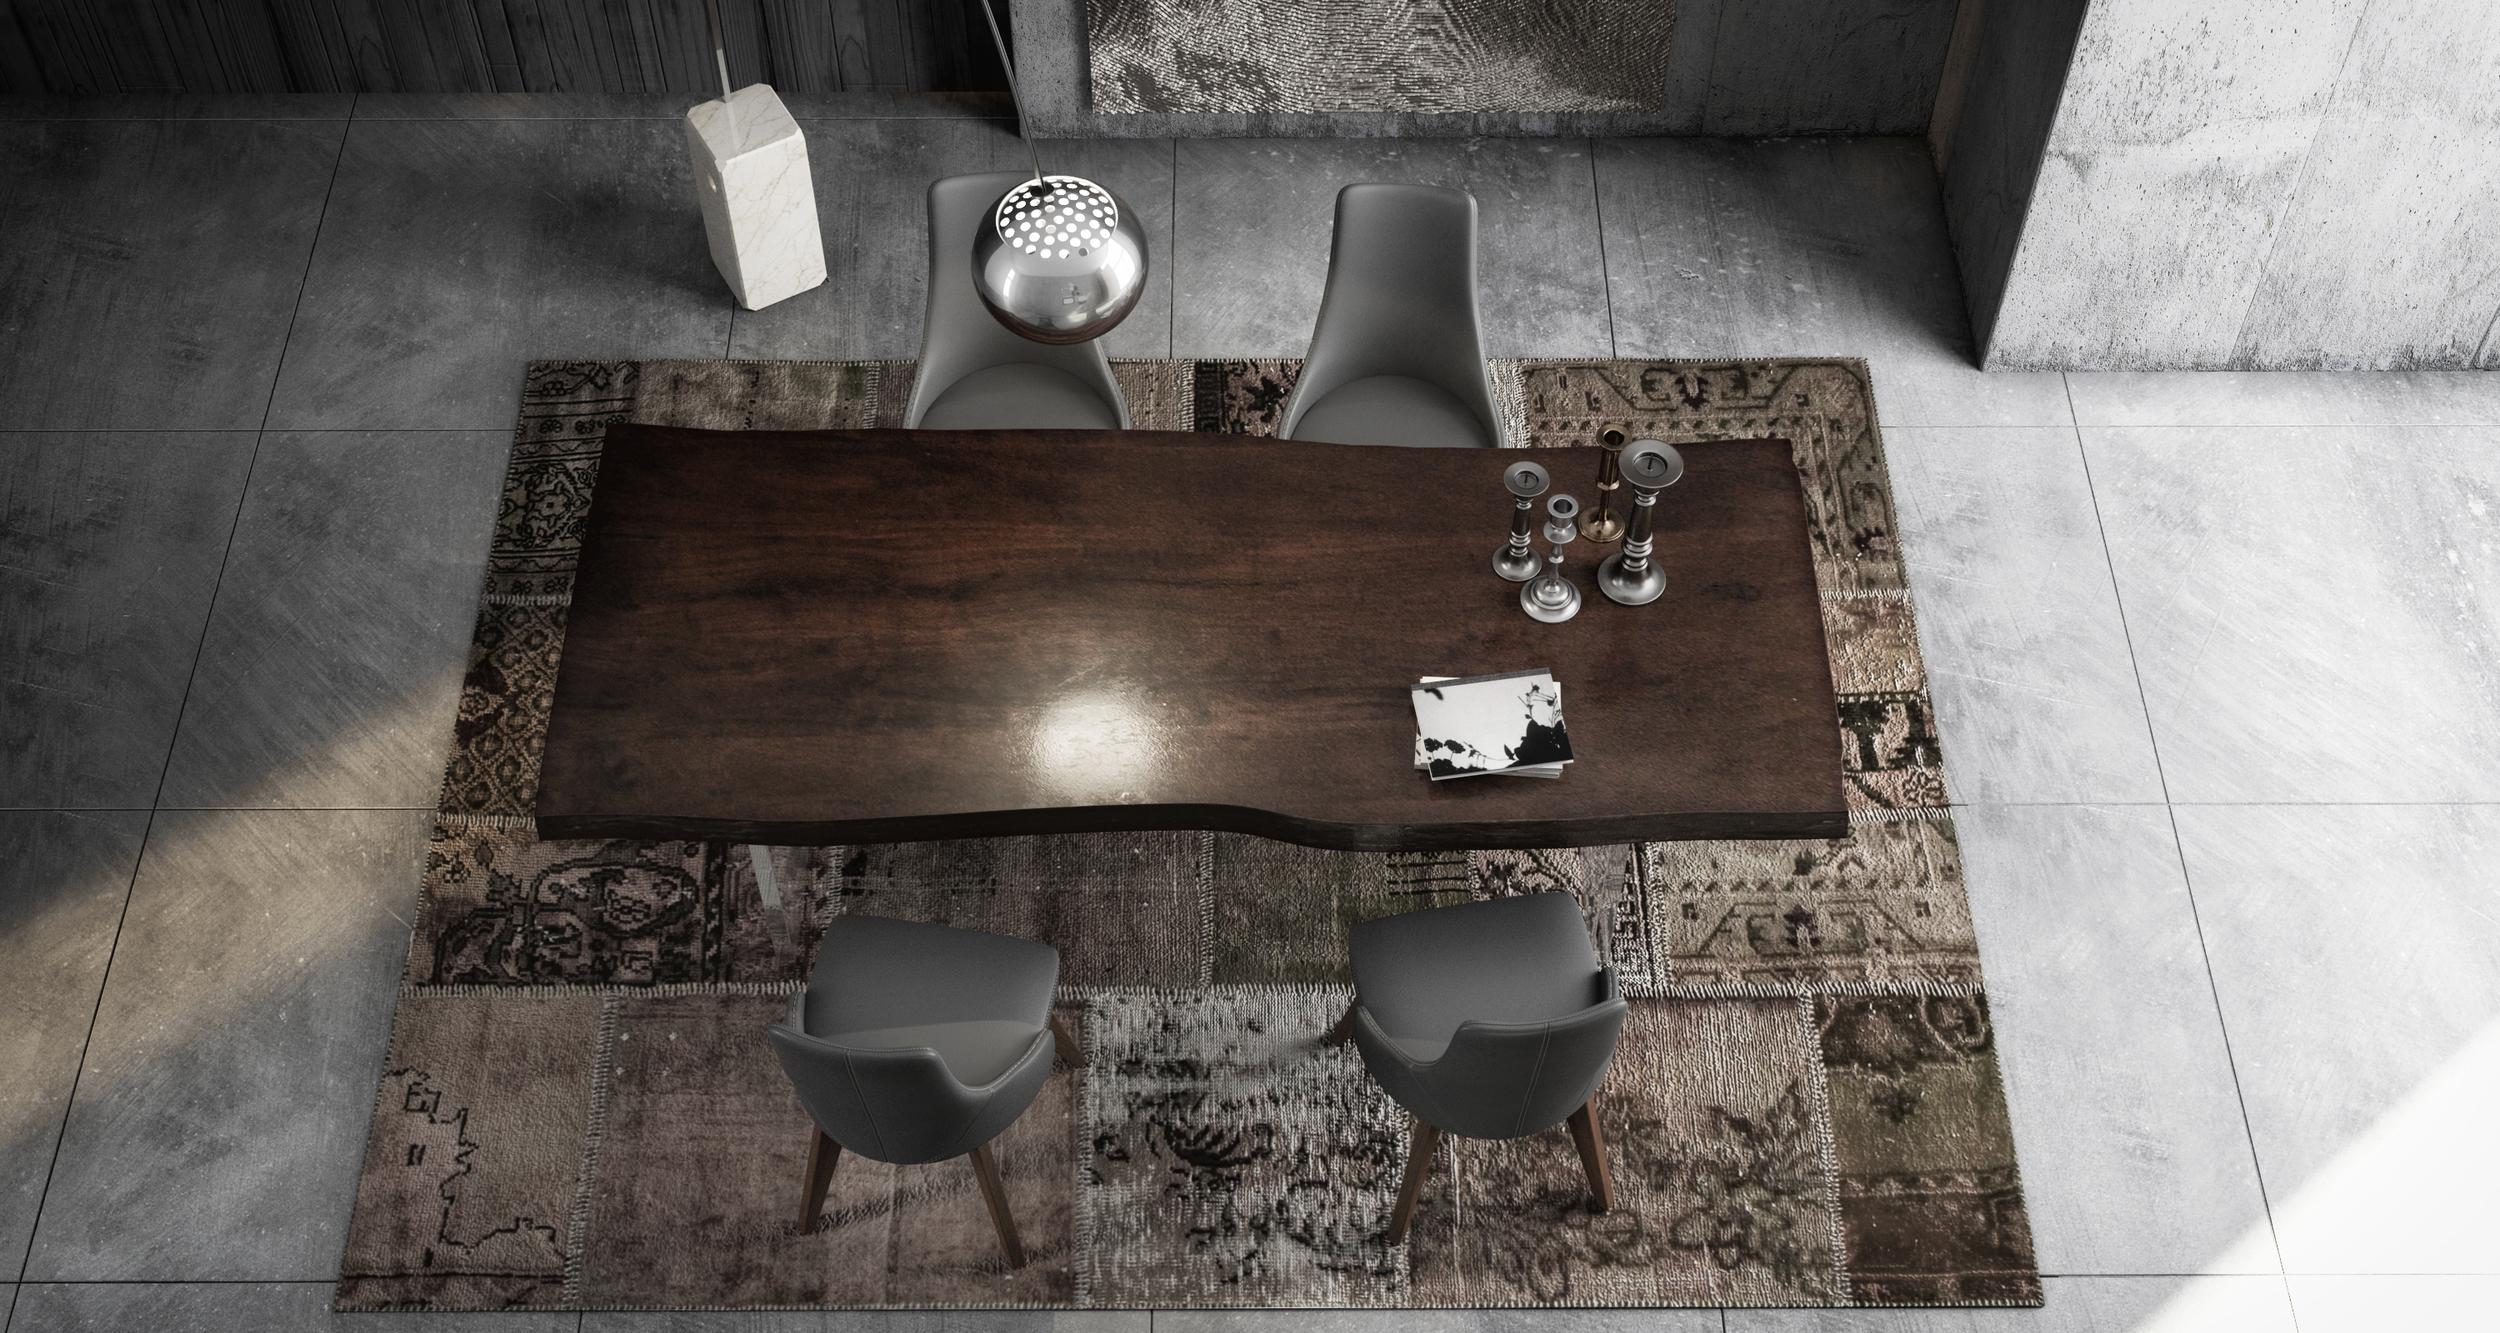 zs_colibri_table_big_ben_brown_scene_v2.jpg